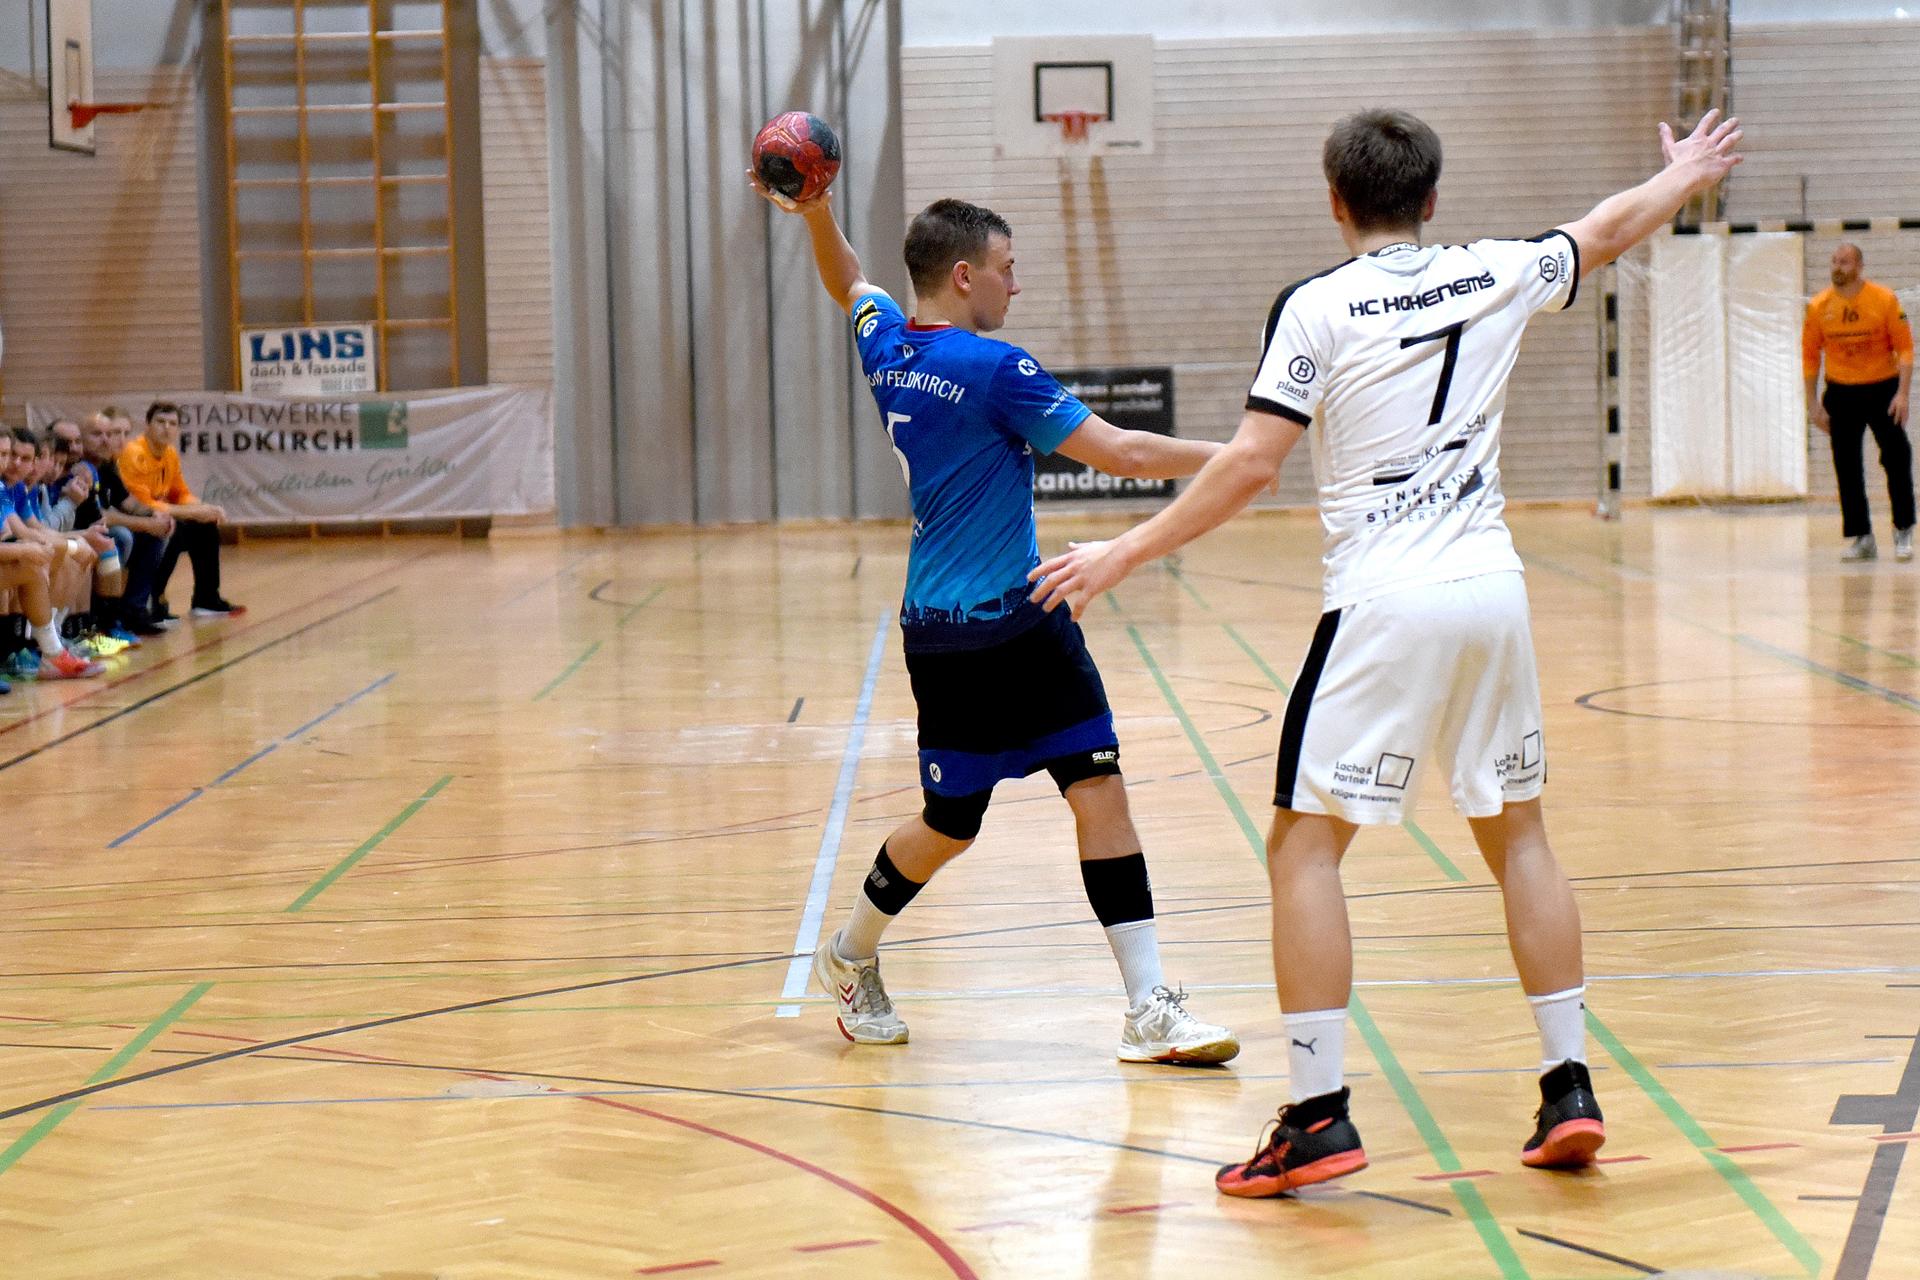 5. Runde Landesliga Staffel 3 2019/20